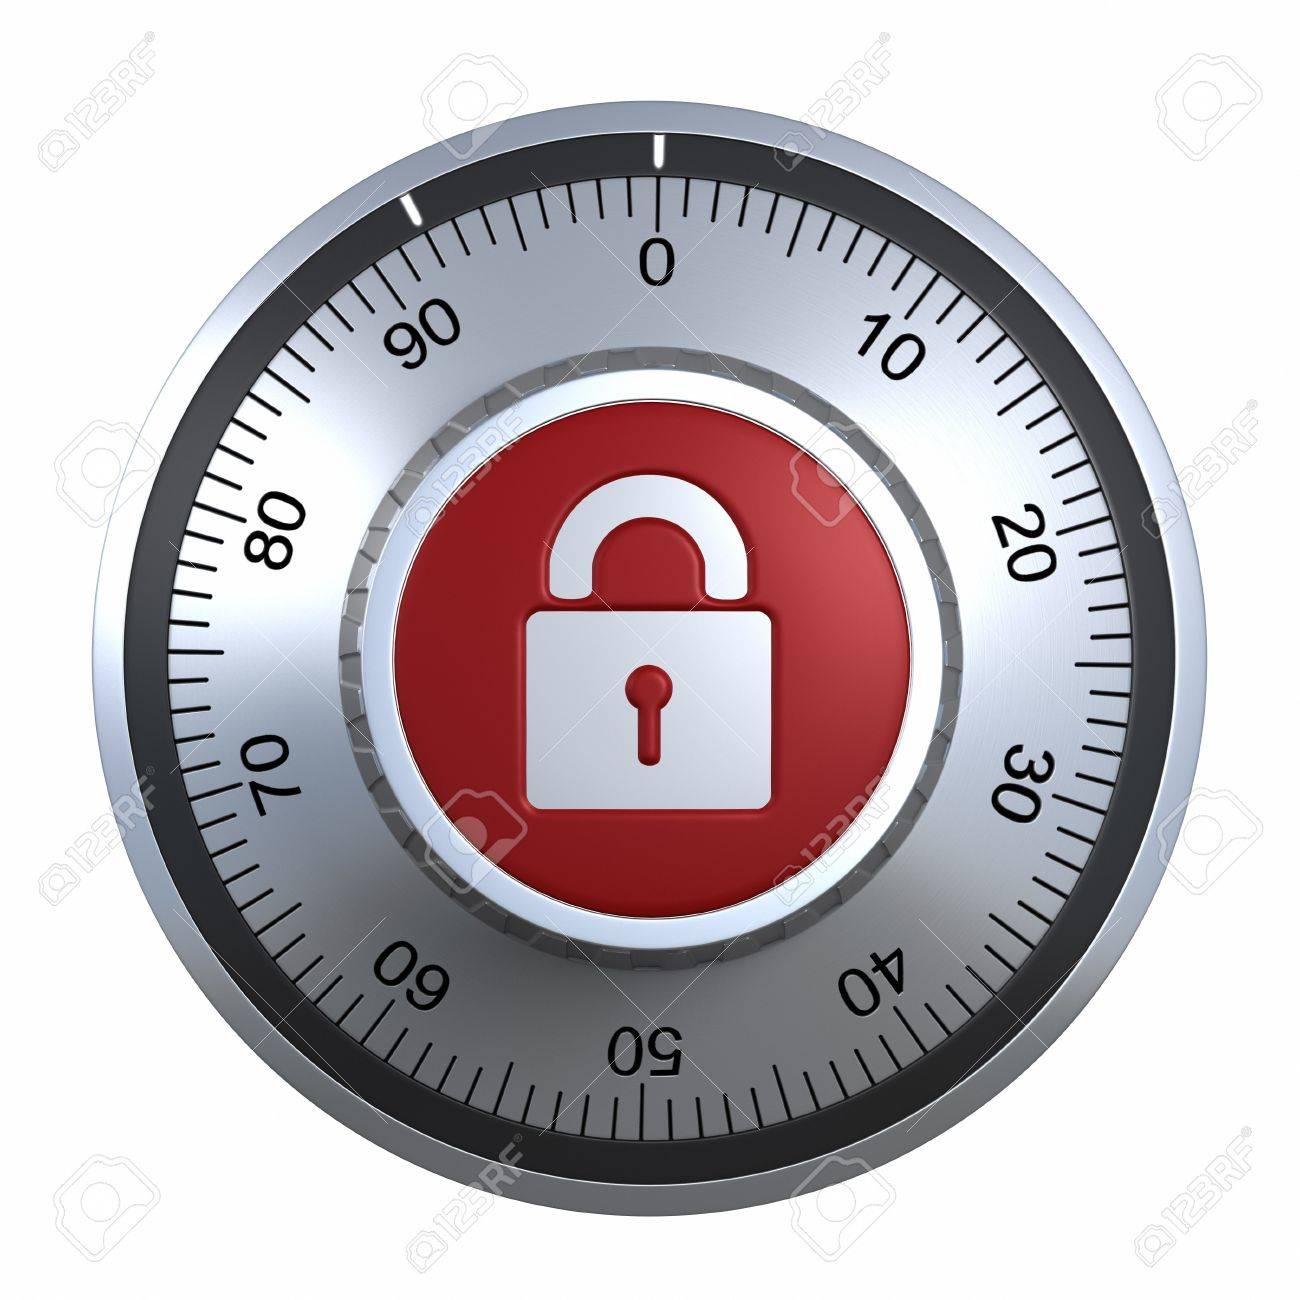 Combination Lock with padlock Stock Photo - 9646667